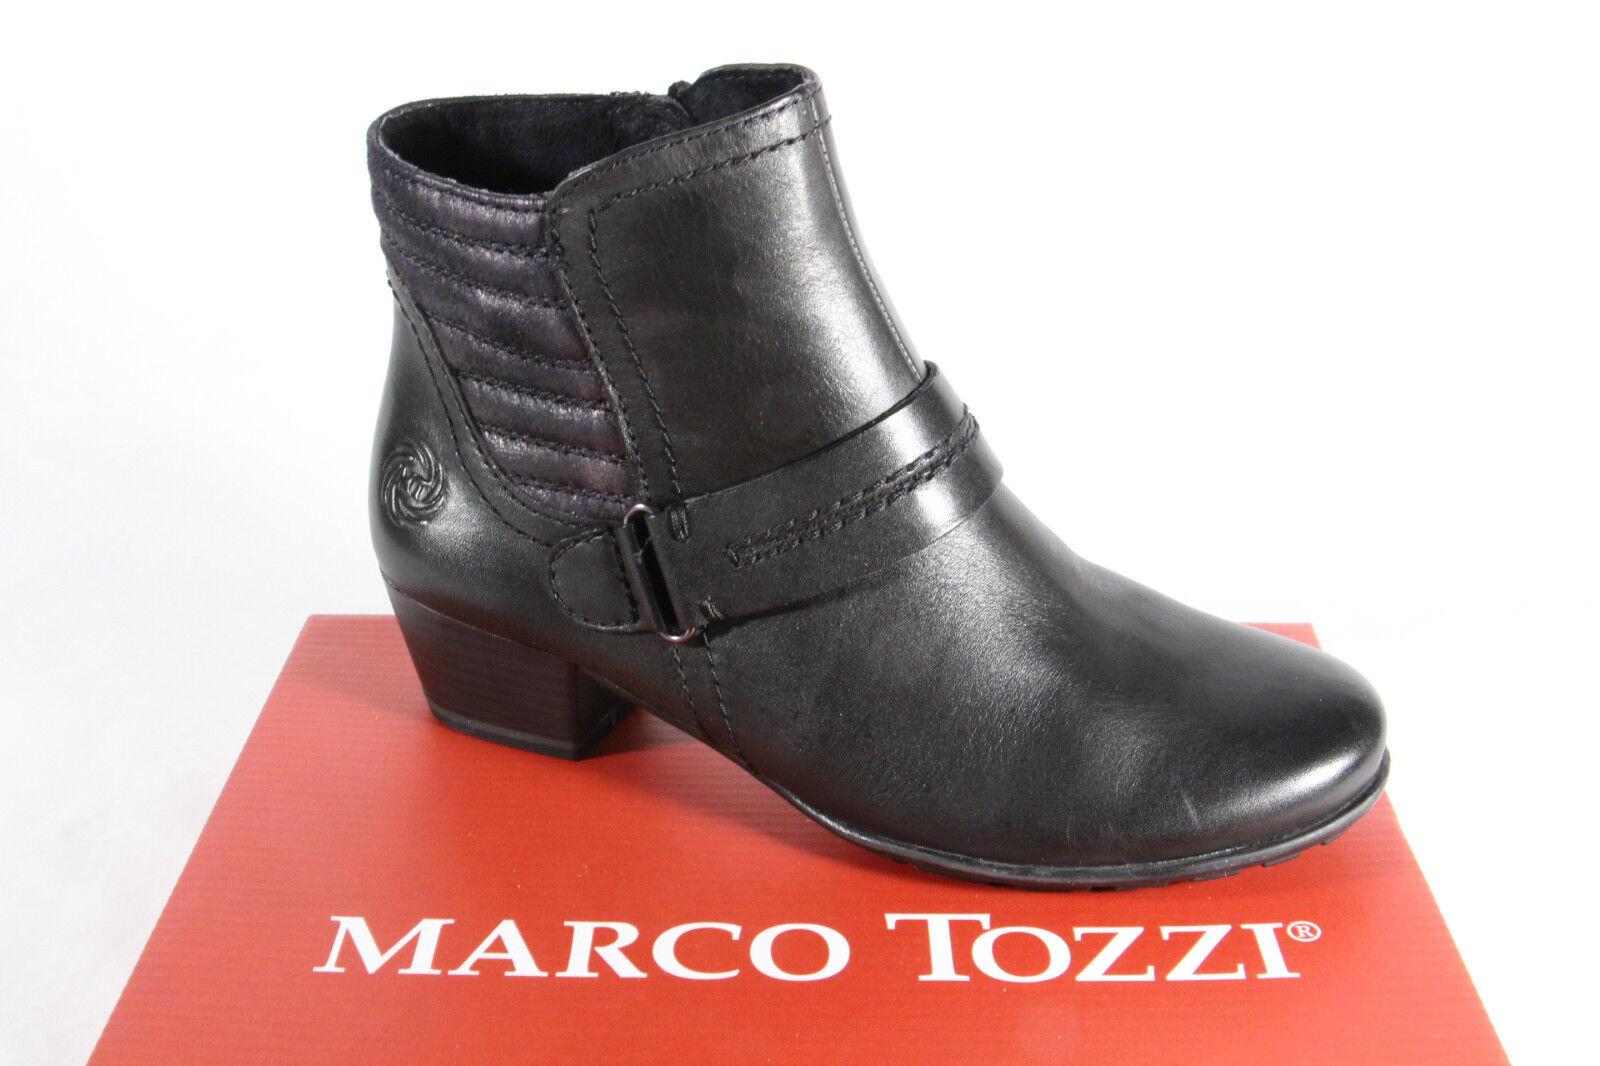 Grandes zapatos con descuento Marco Tozzi Botines cremallera,blando fußbett,Forrado 25003 NUEVO